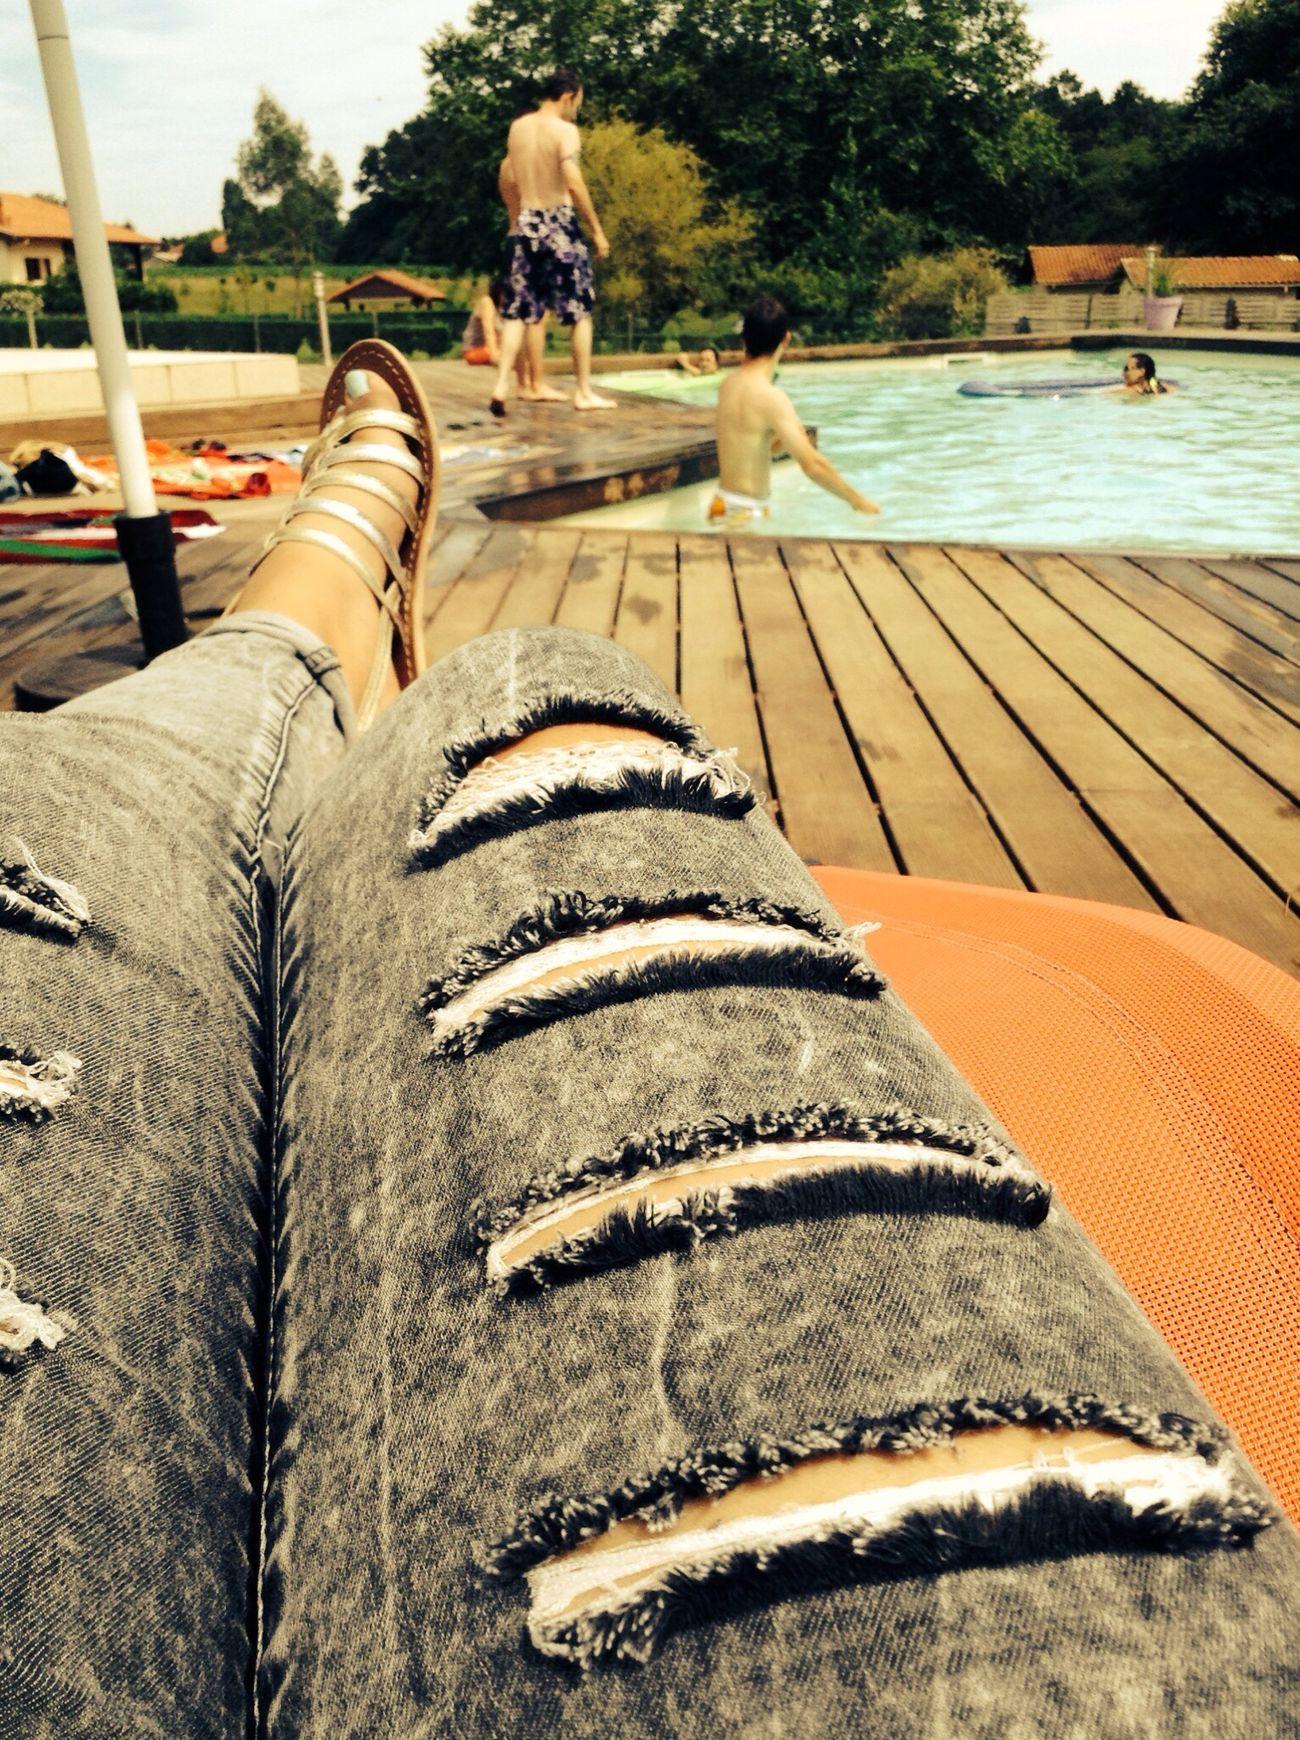 Pool Party Soleil Posey Au Calme